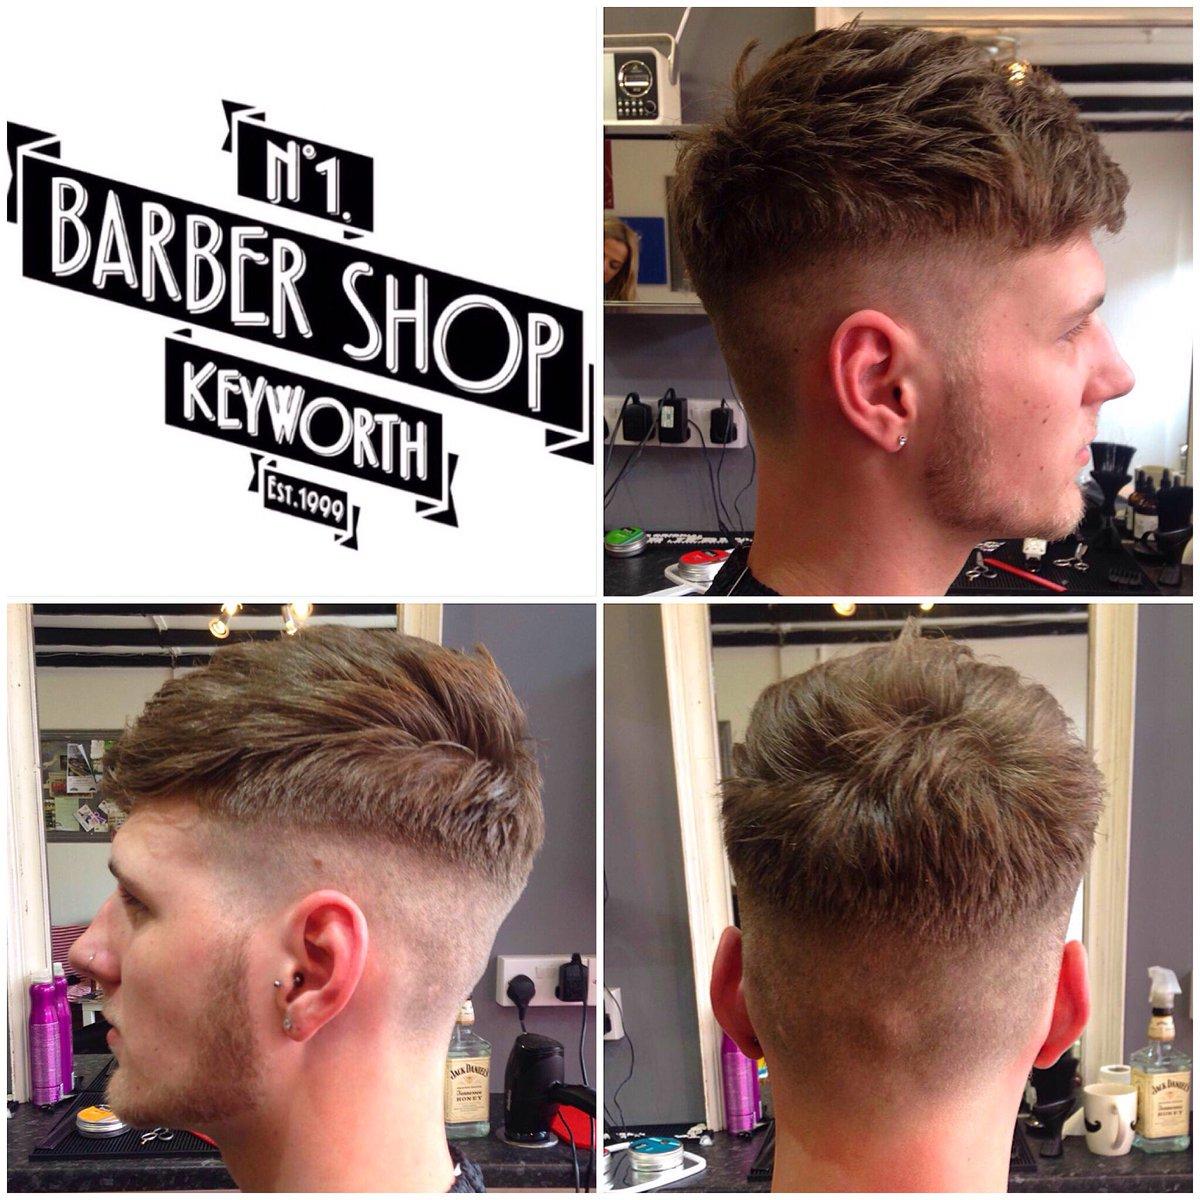 Number One Barbers Keyworthbarbers Twitter